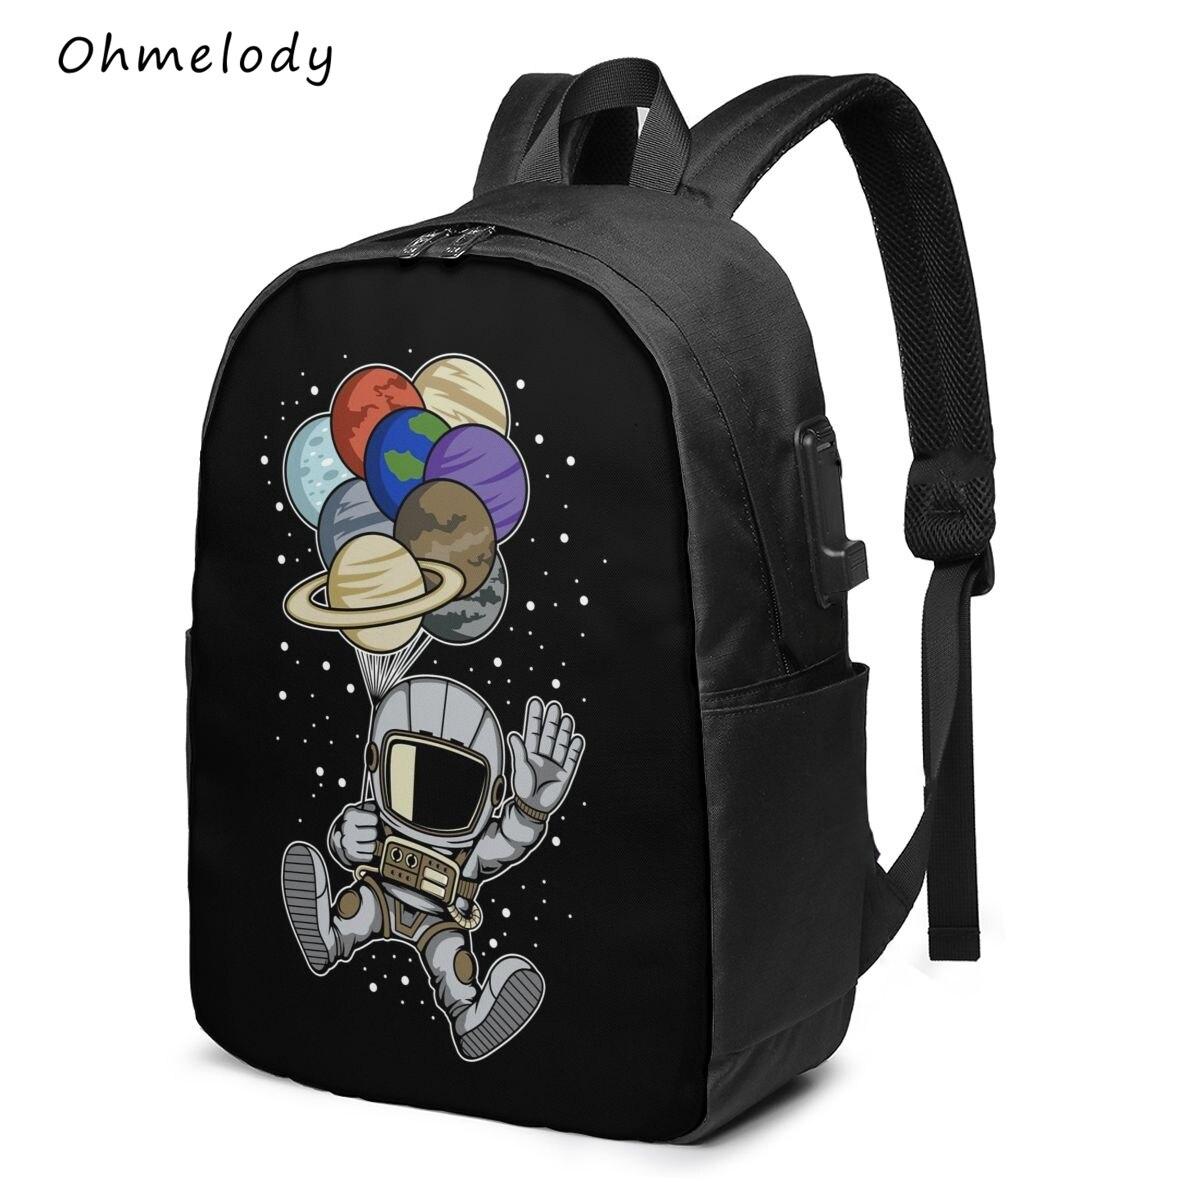 Multipurpose 17in Laptop Backpack Water Resistant Durable Cartoon Astronaut School Bag College Backp